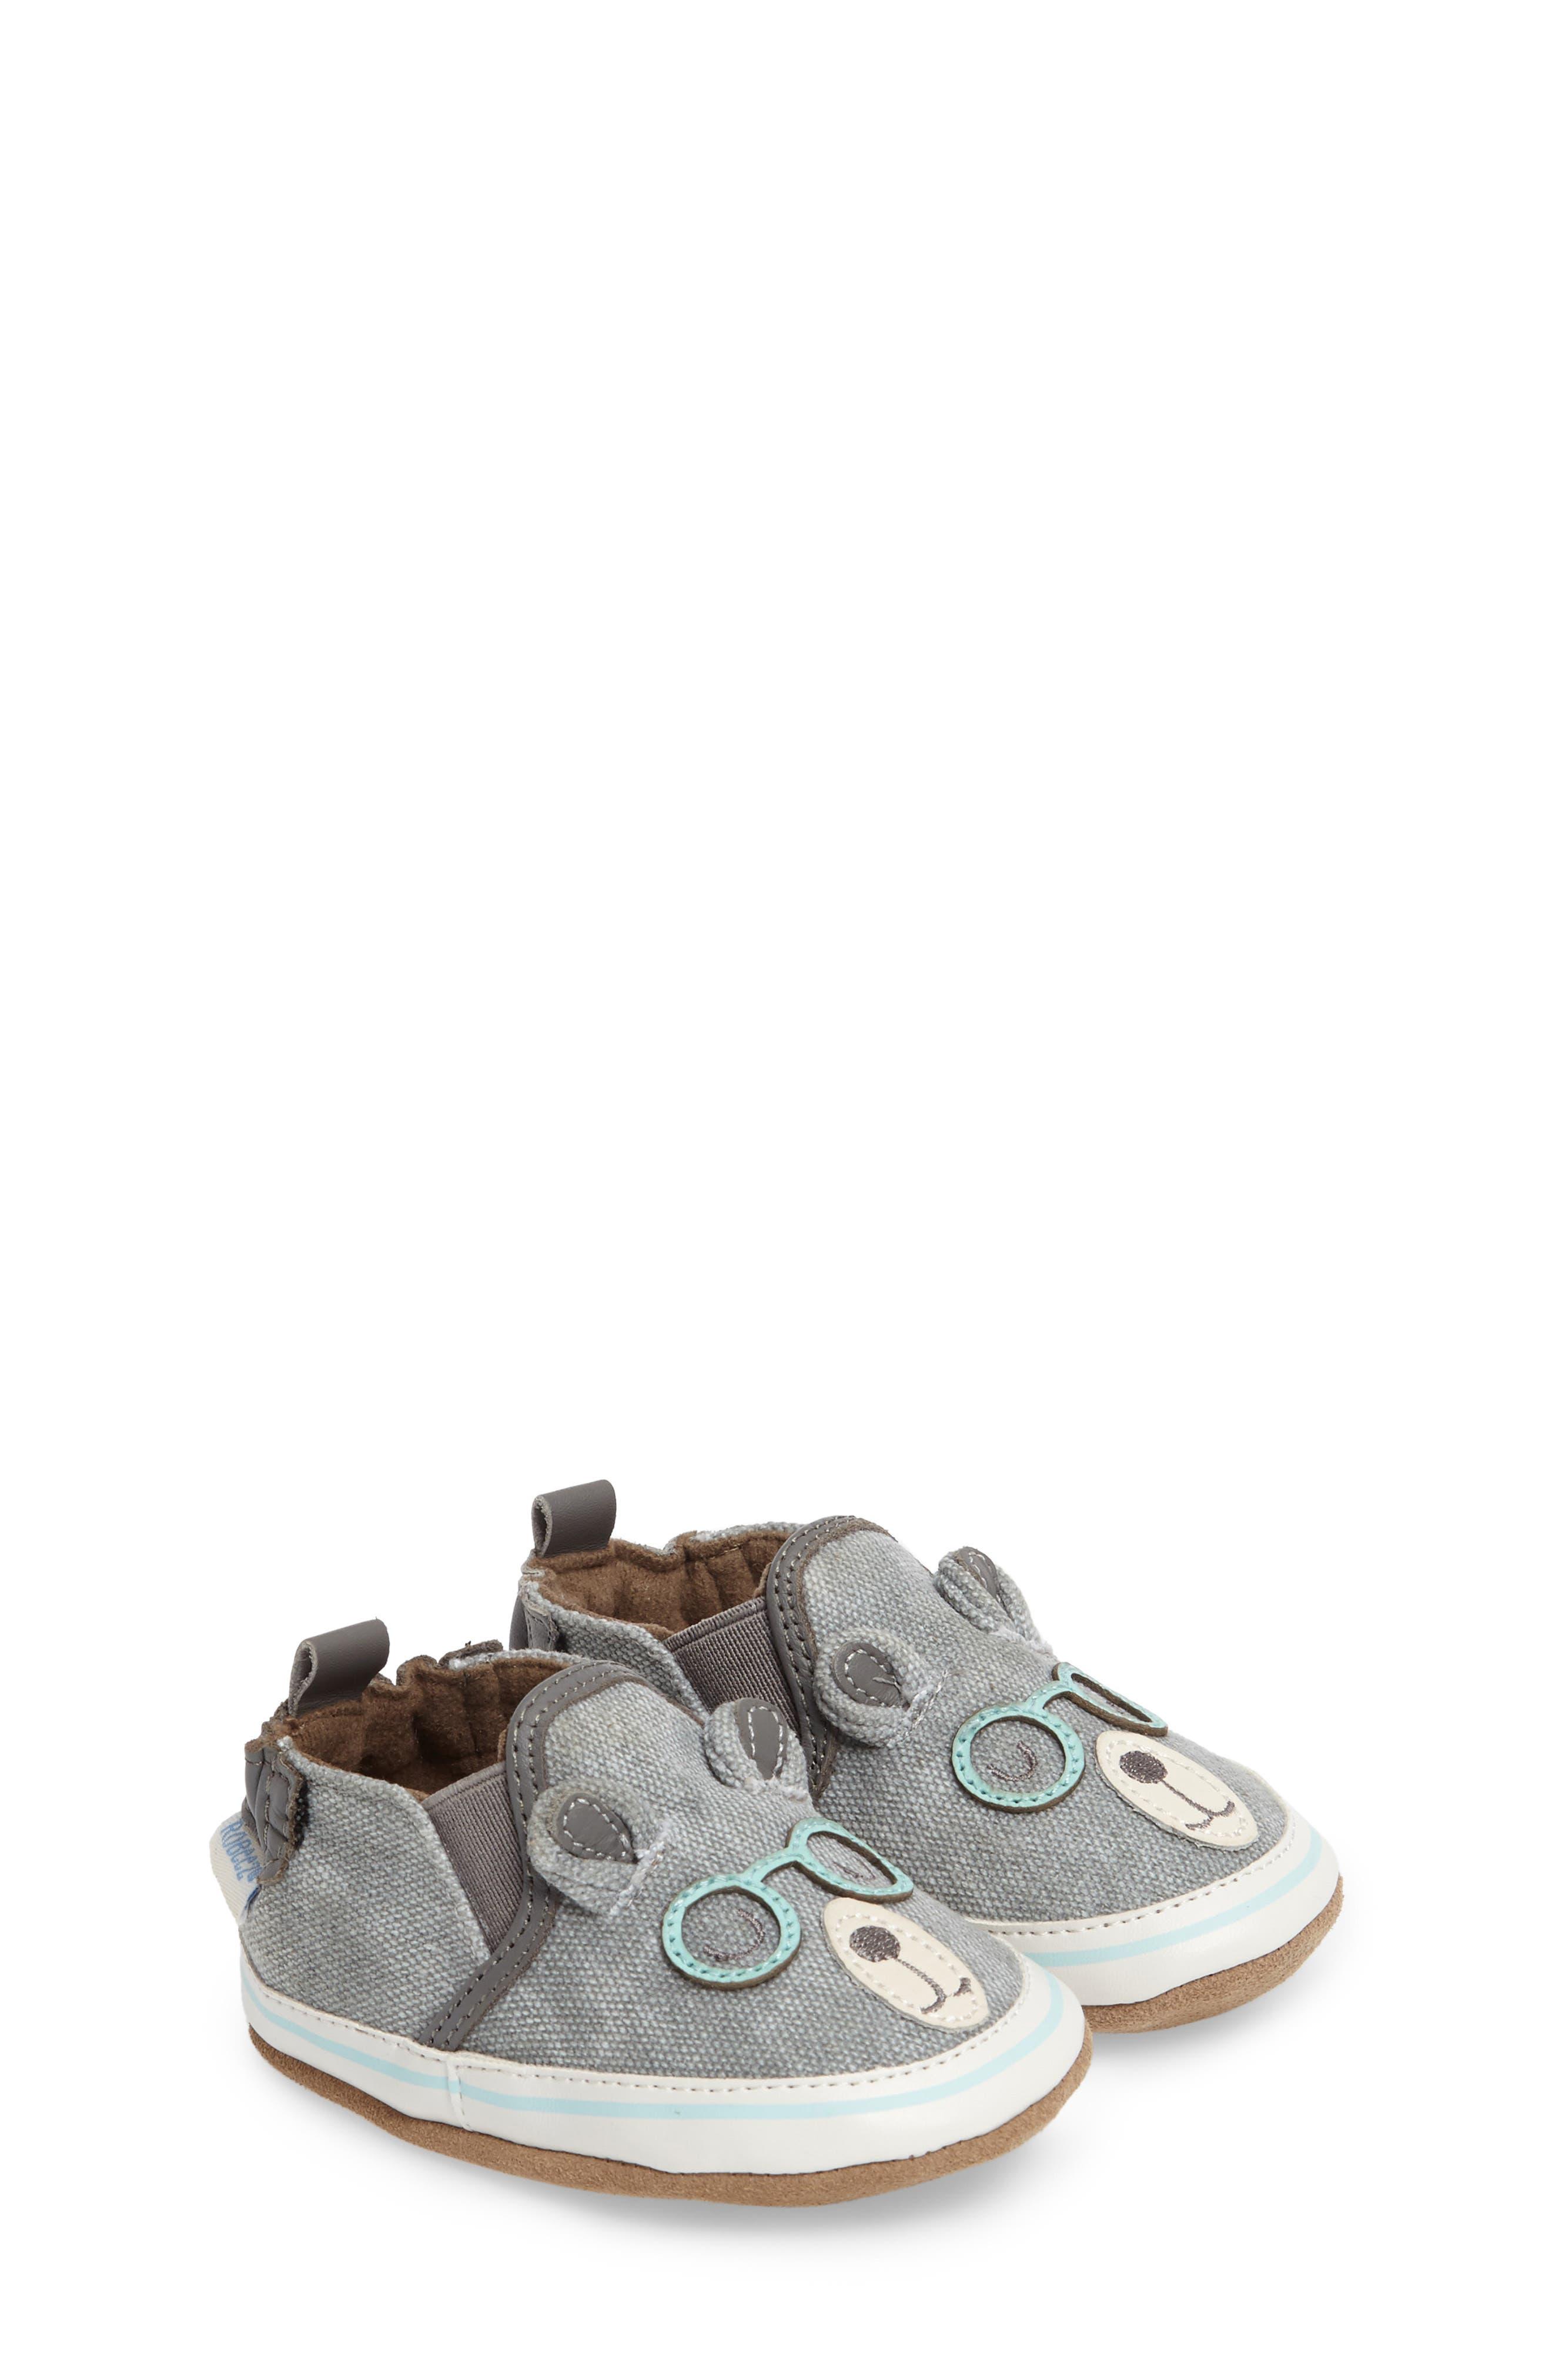 Main Image - Robeez® 'Brainy Bear' Crib Shoe (Baby & Walker)